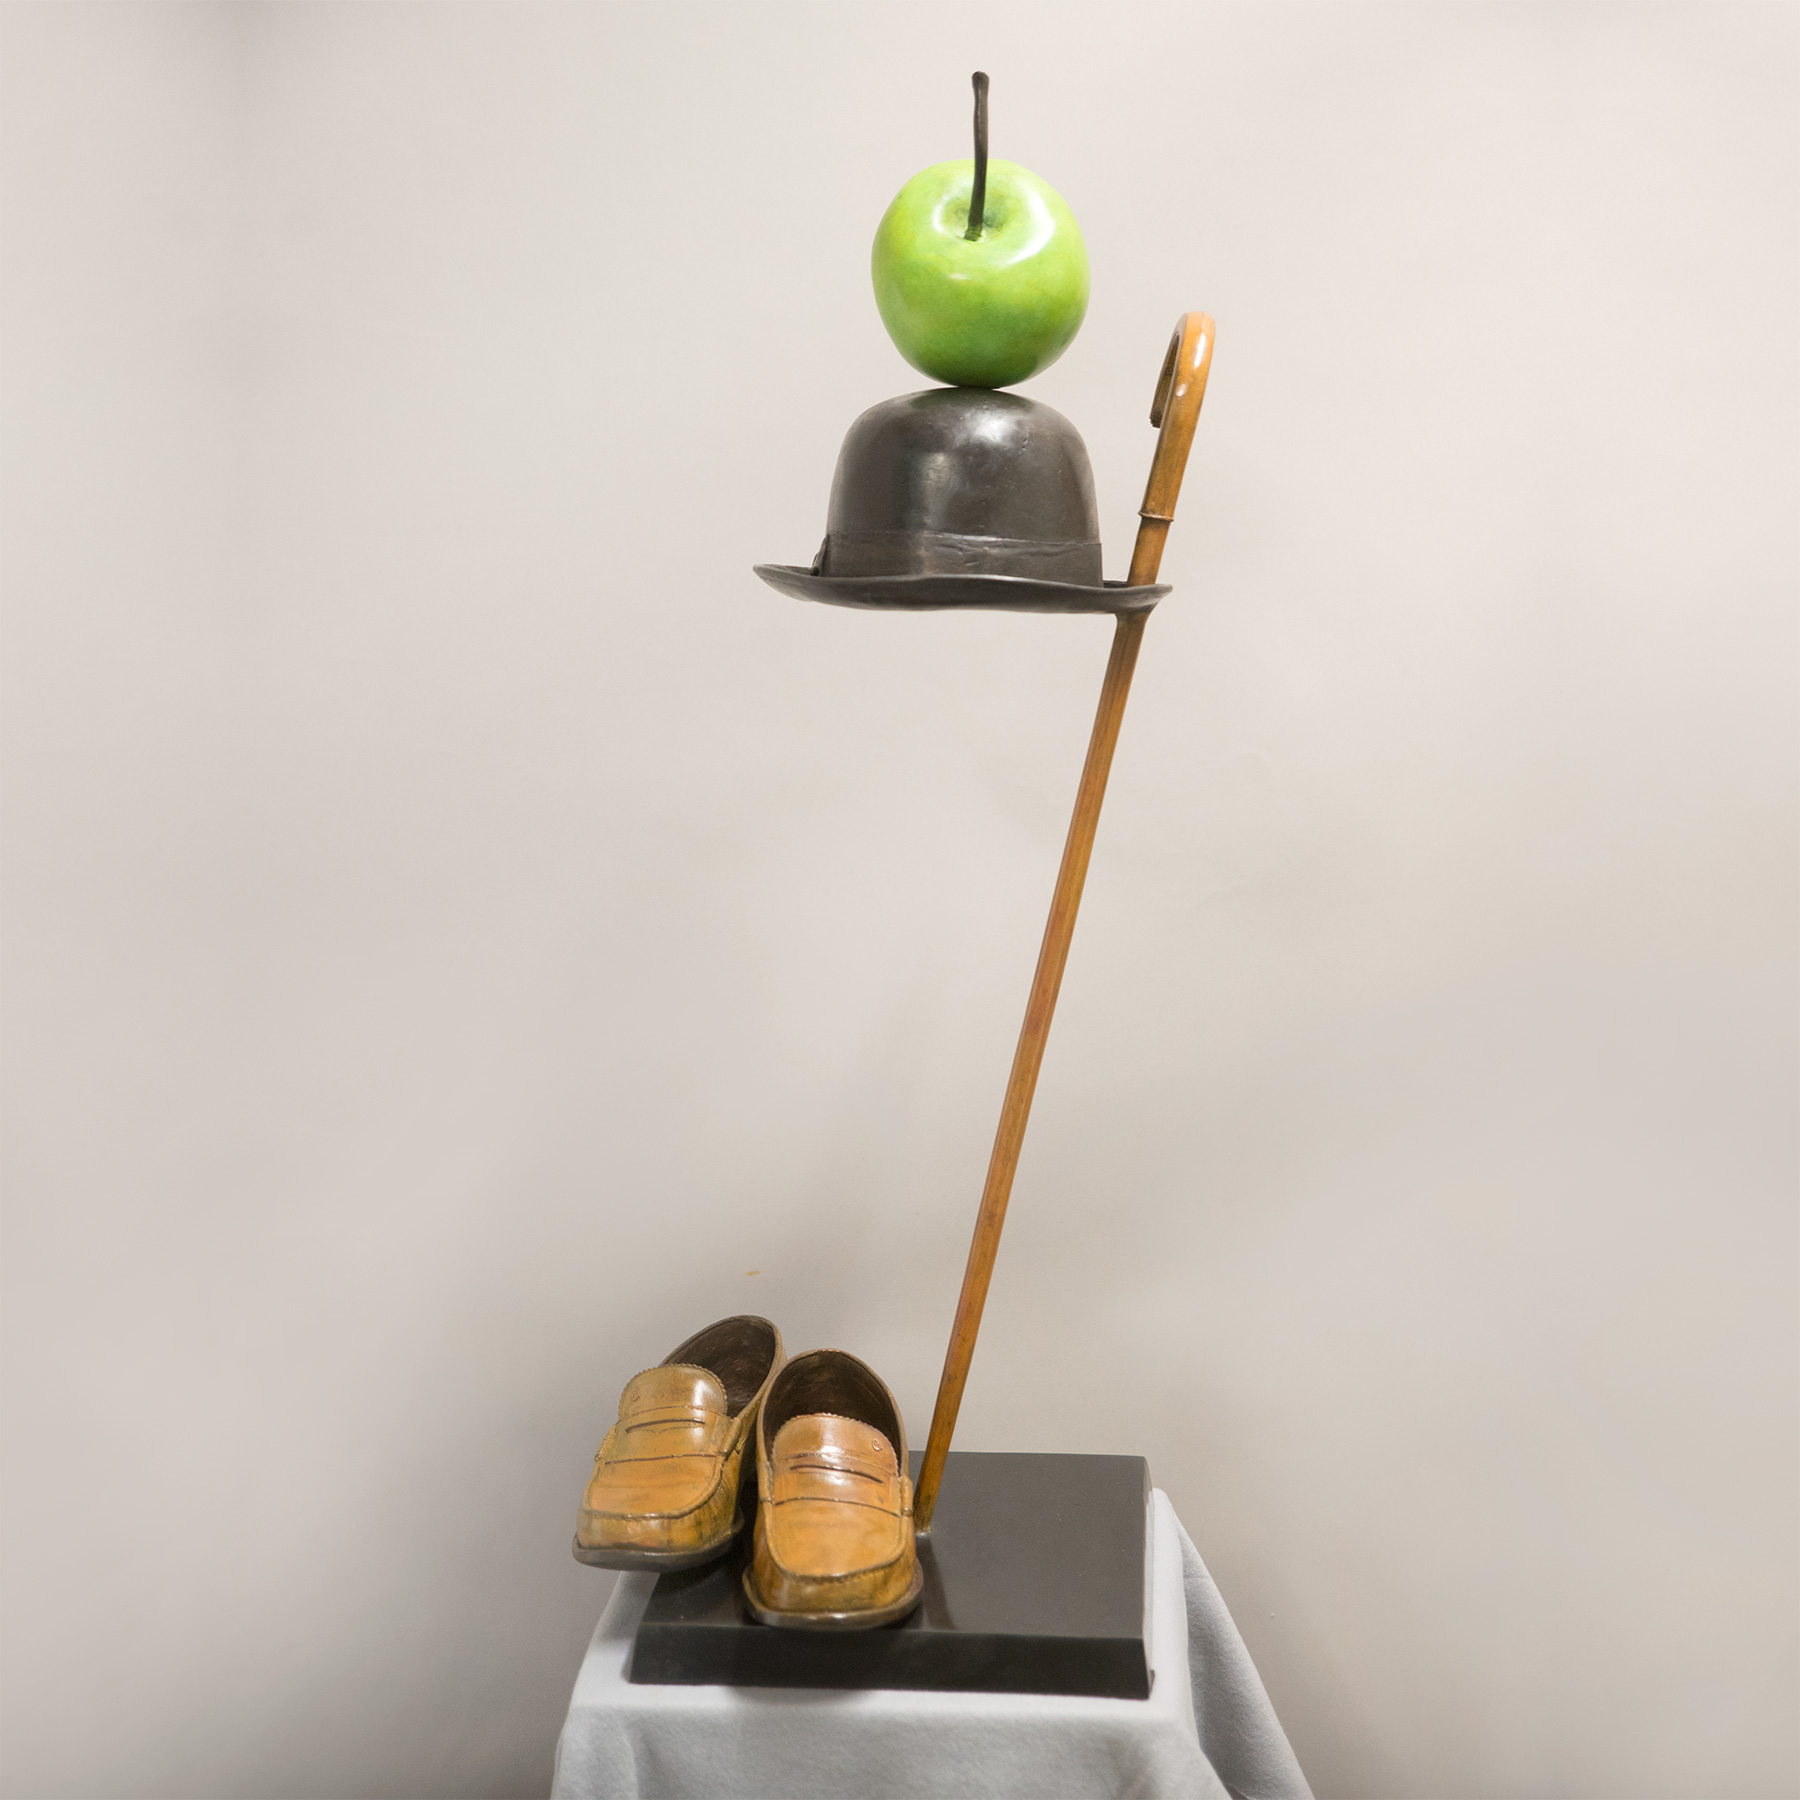 sculpture-in-balance-ii